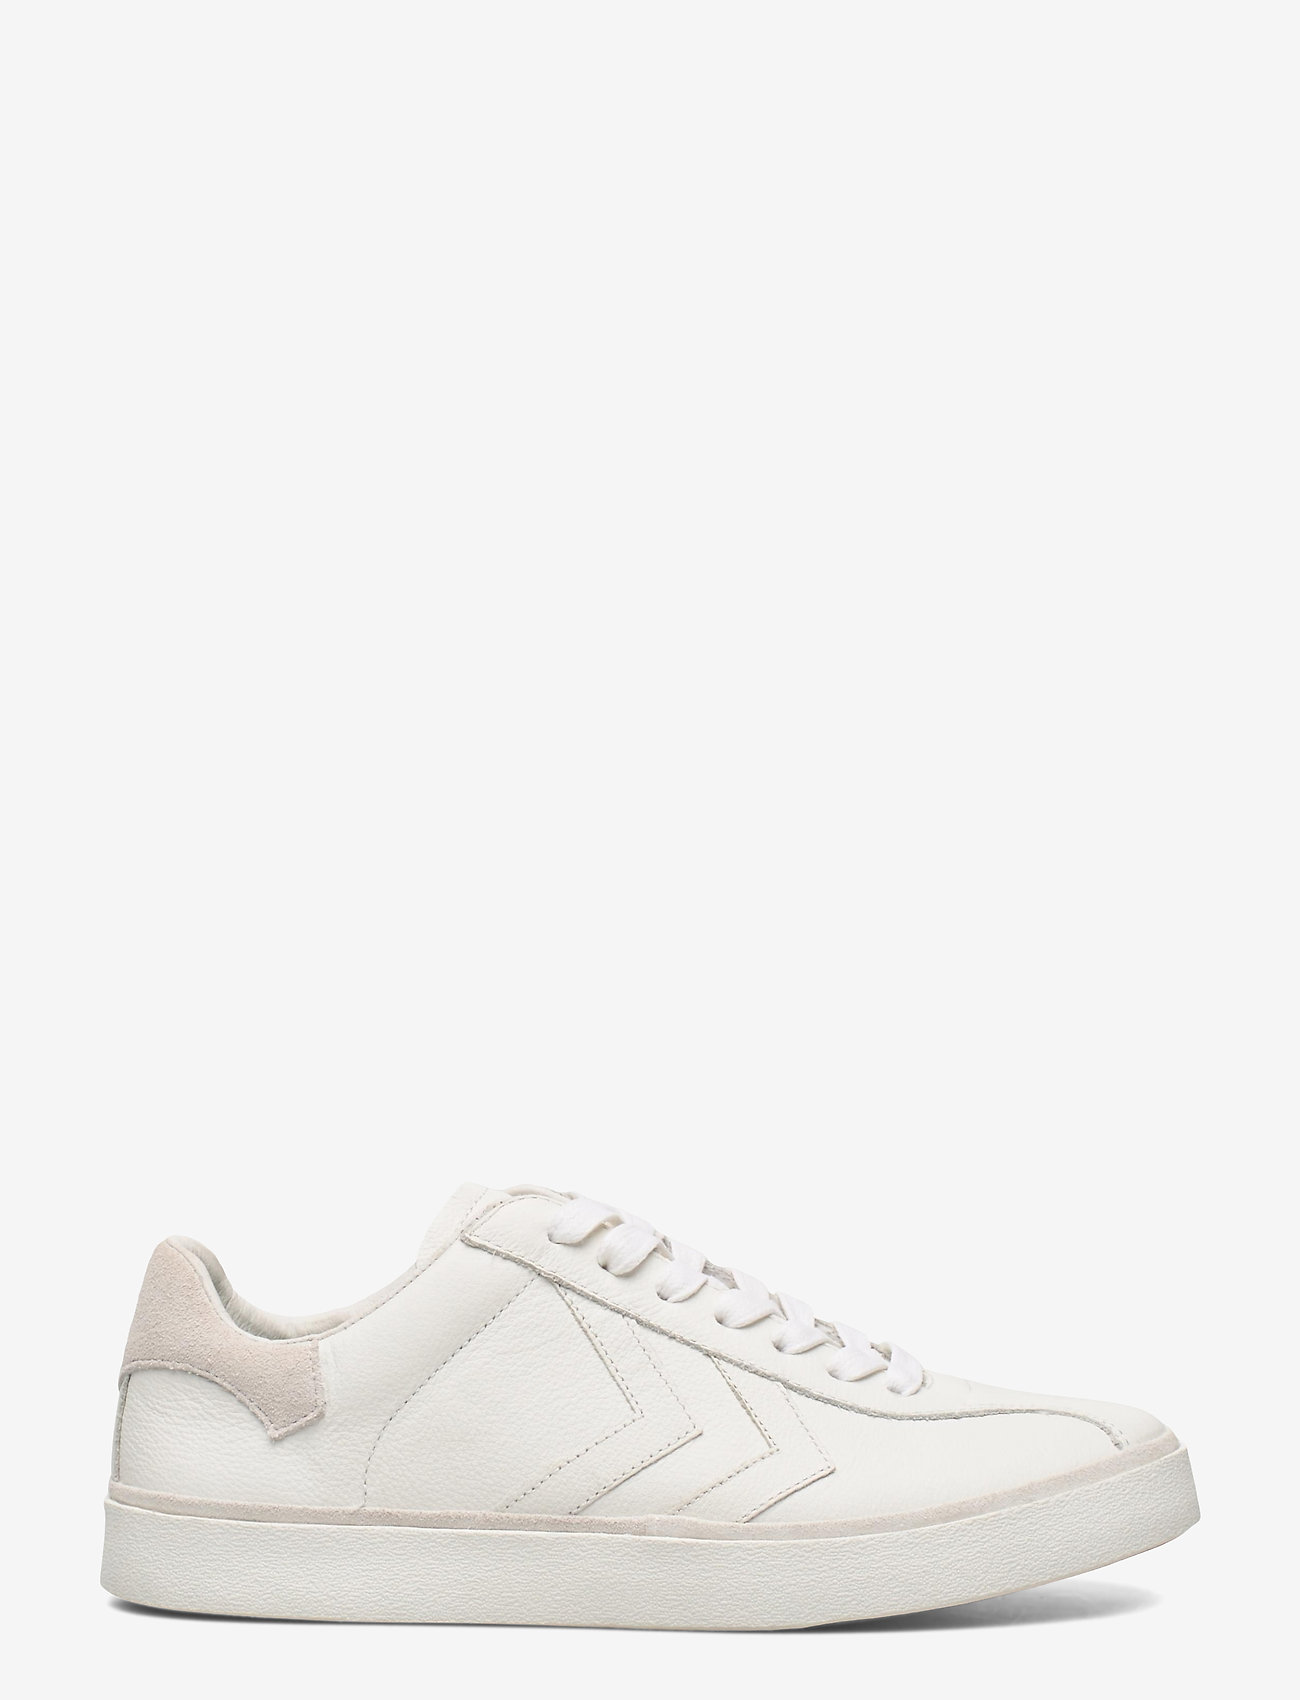 Hummel - DIAMANT - laag sneakers - white - 1